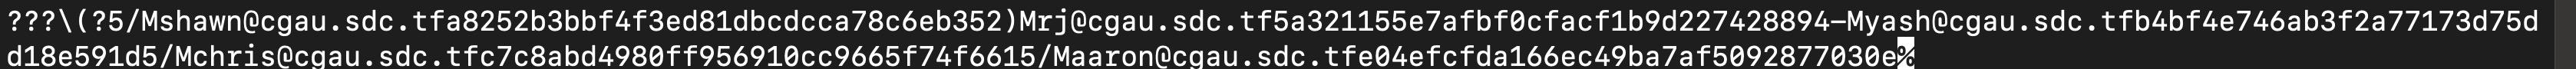 97808B56-FBBE-47E4-AC93-71595B60FF14.png